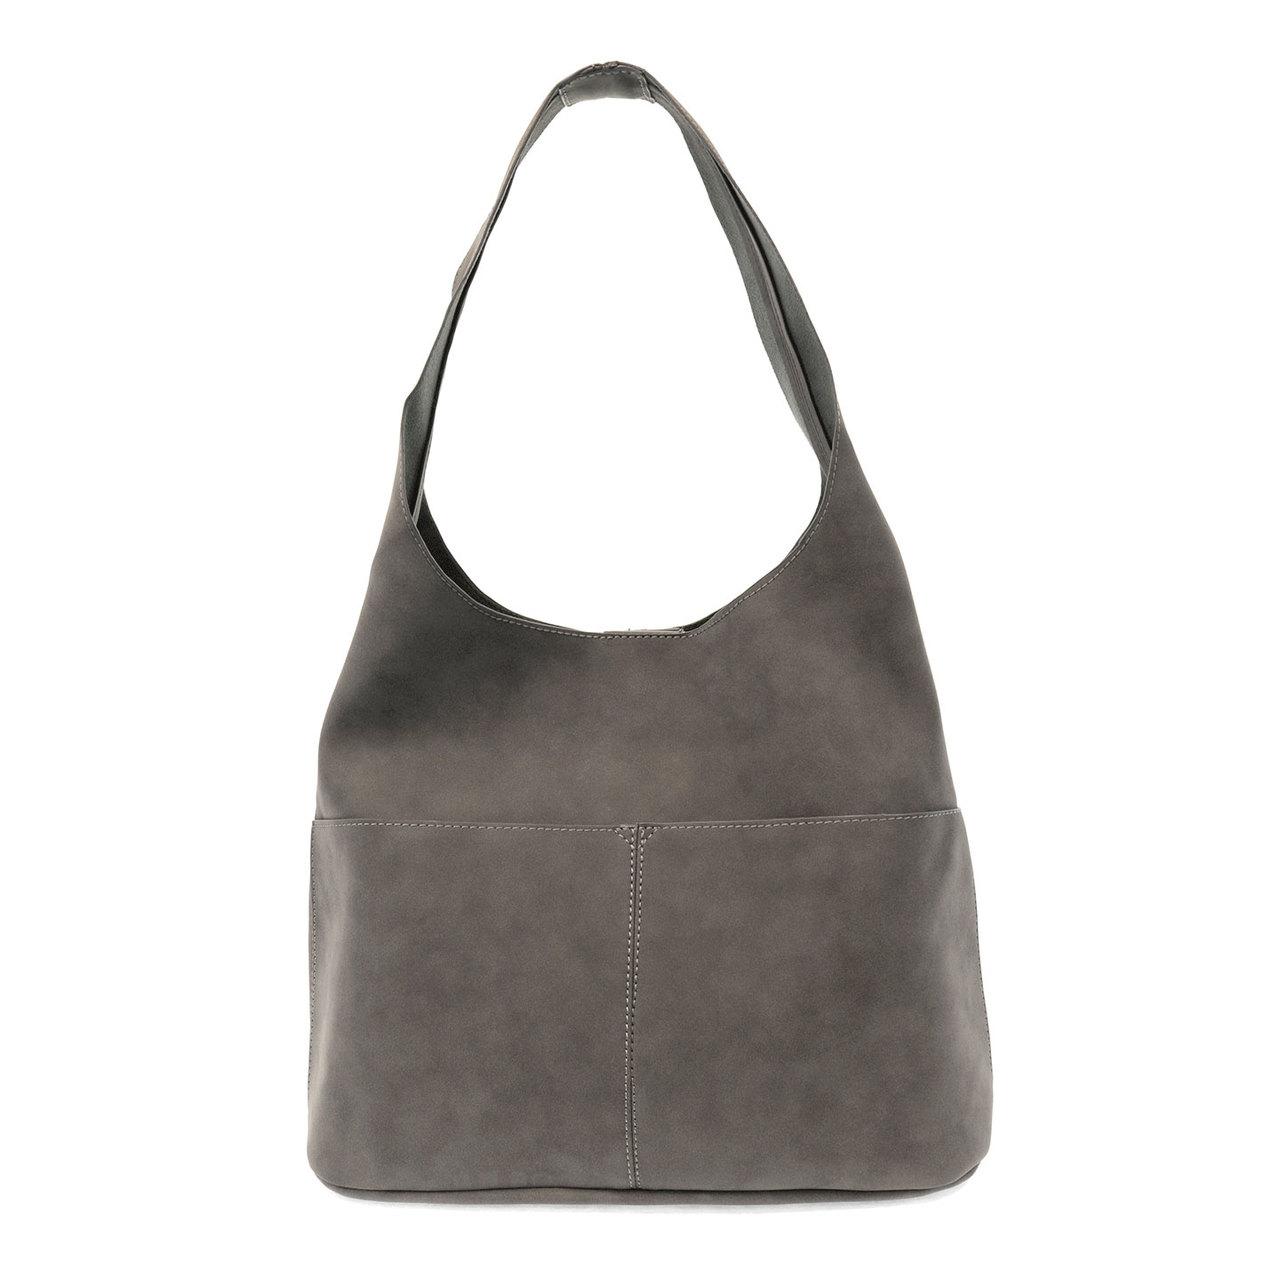 79bc7de0ed03 Joy Susan Jenny Hobo Handbag - Dark Grey